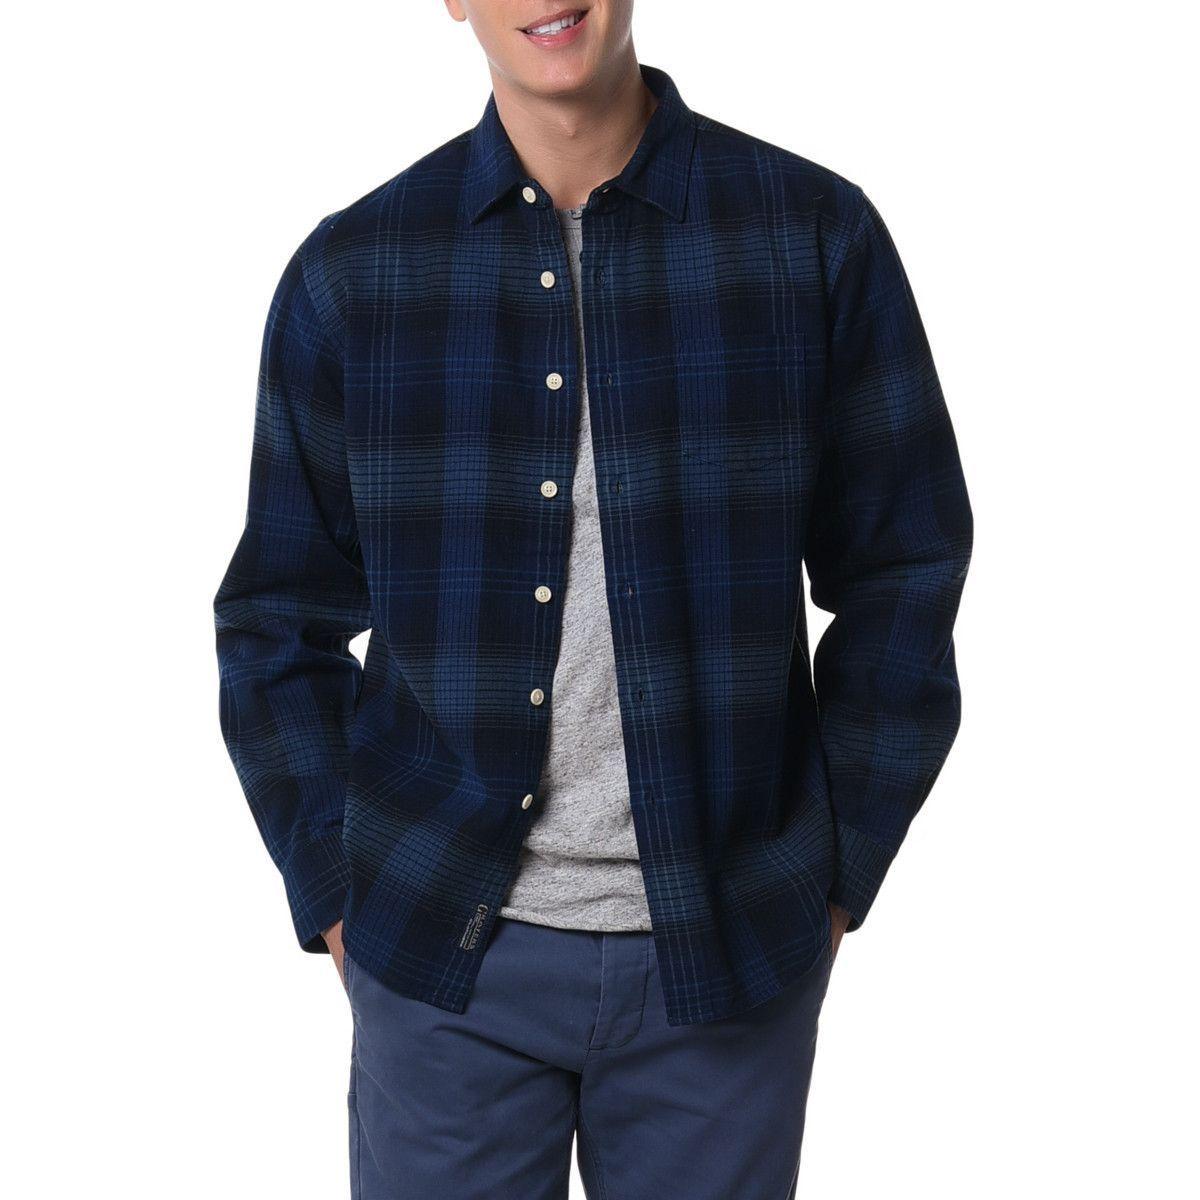 Flannel shirt season  Grayers Hewitt Heritage Brushed Heather Twill Flannel Shirt  Shirts